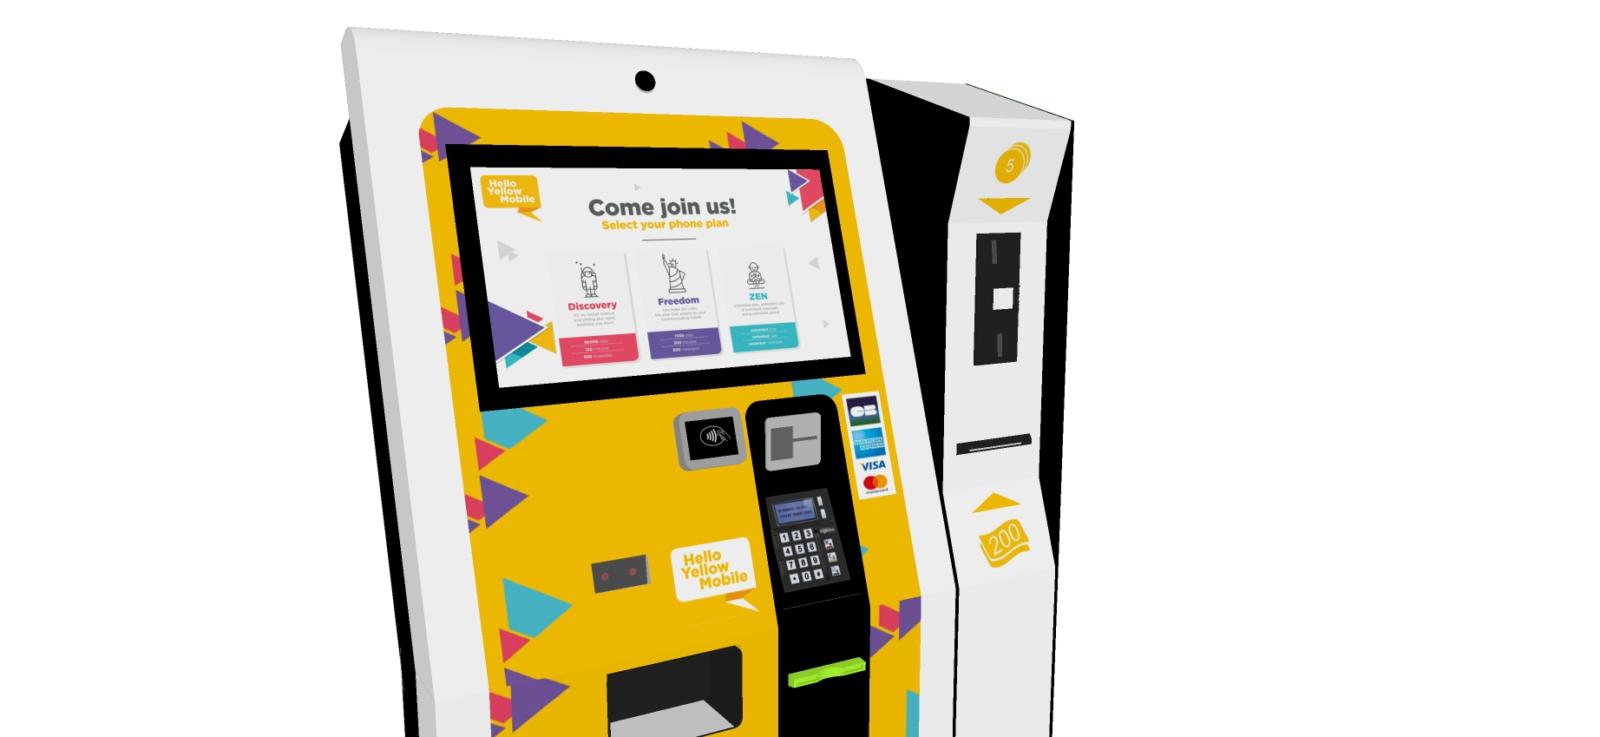 Kiosco de distribución de tarjetas SIM -cash-IPM France